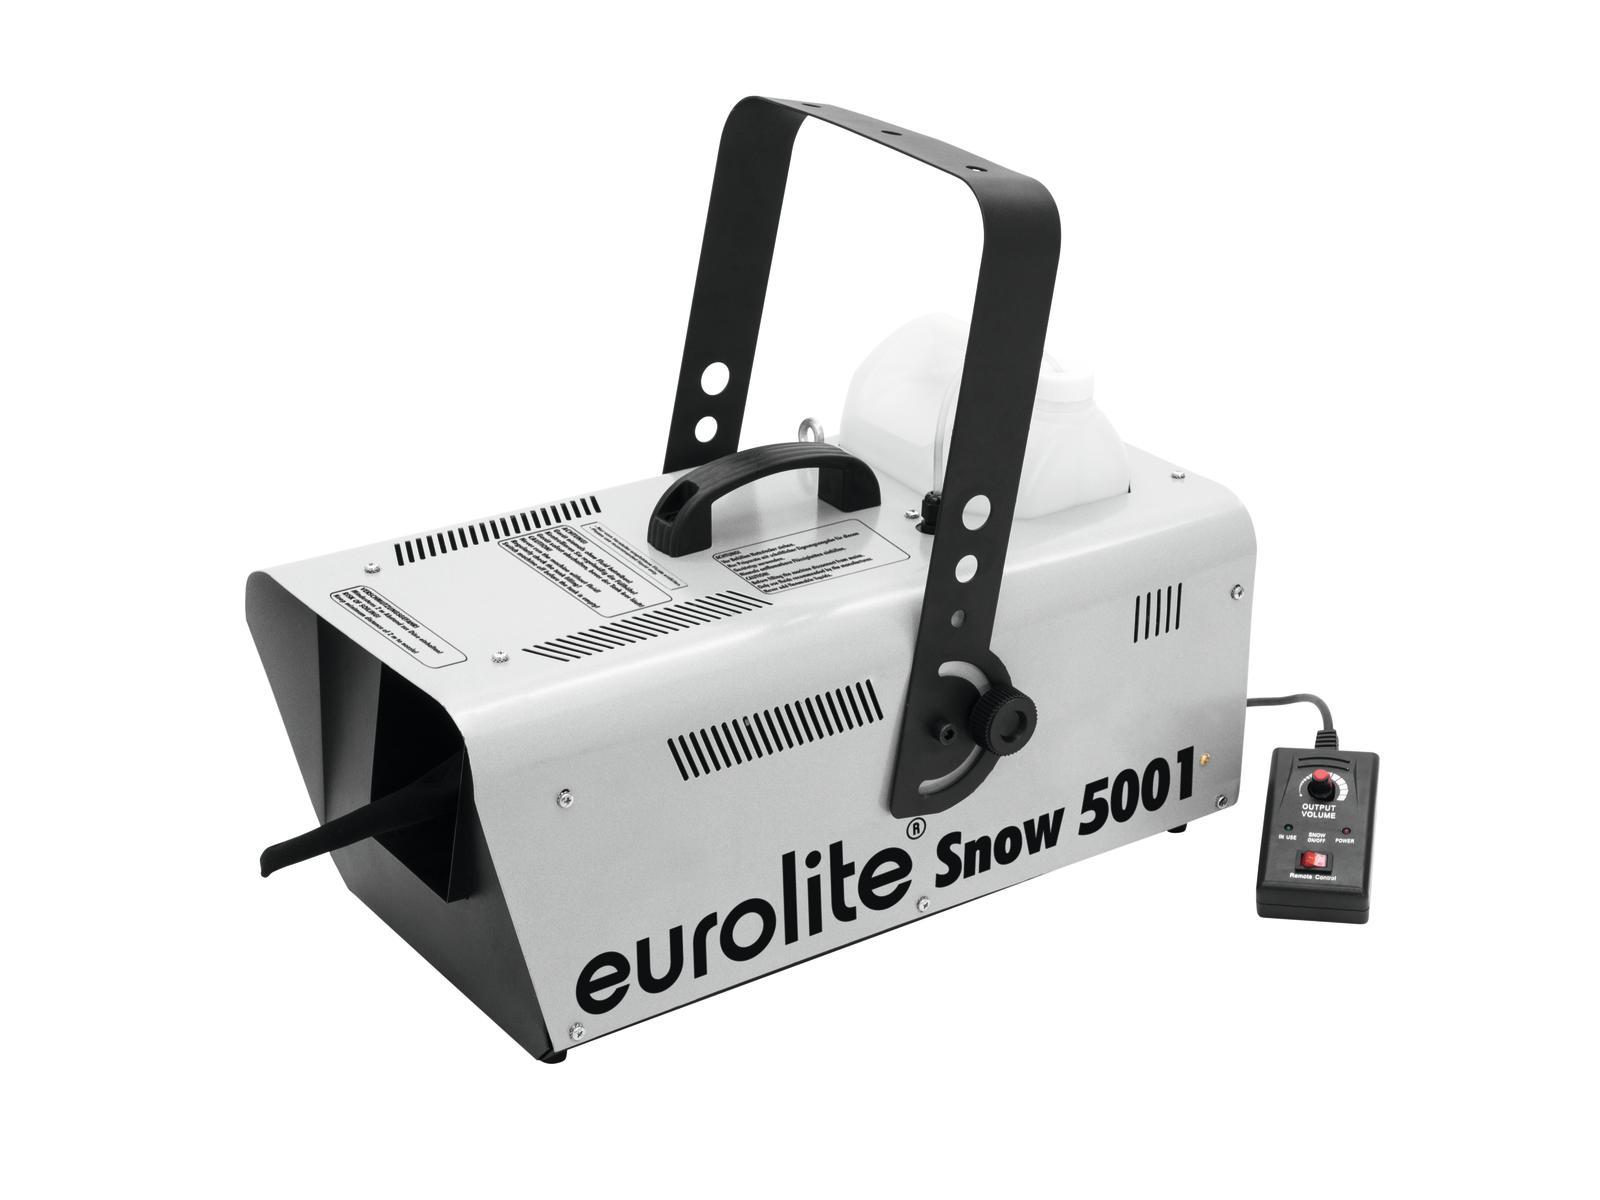 Eurolite Snow 5001, výrobník sněhu